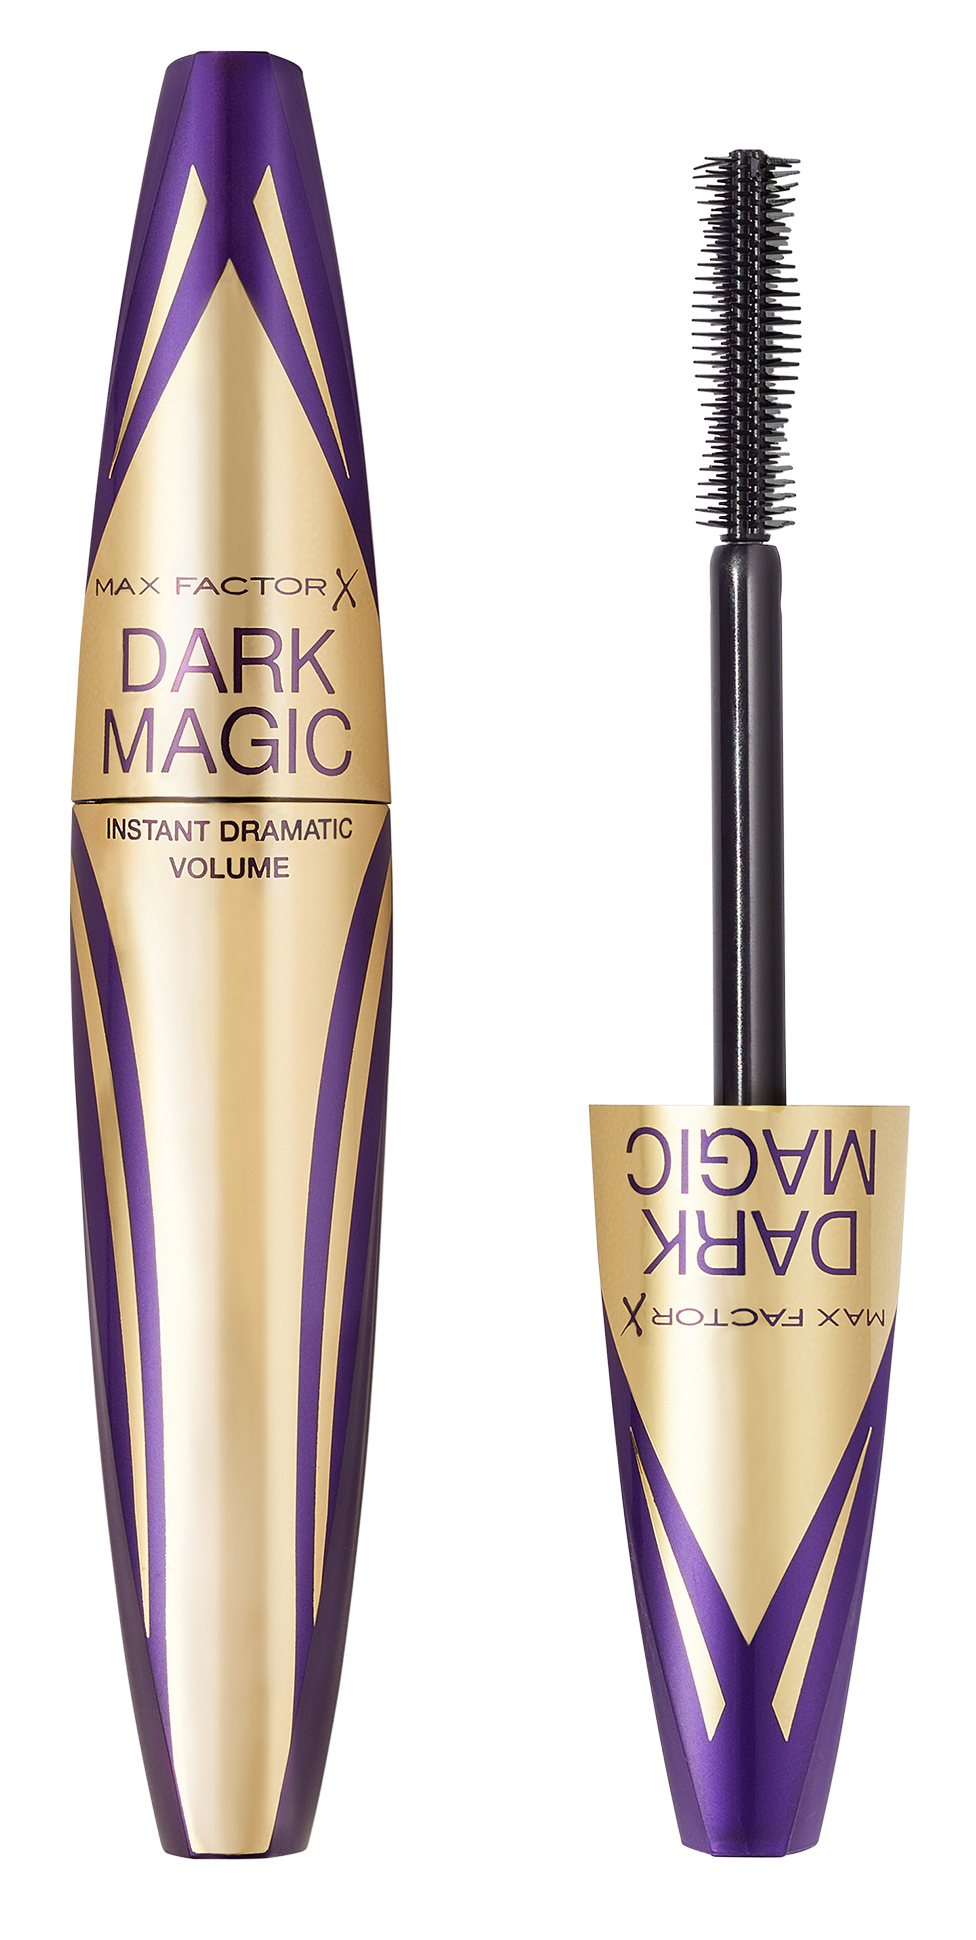 MAX FACTOR Тушь объемная для ресниц / Dark Magic Black brown